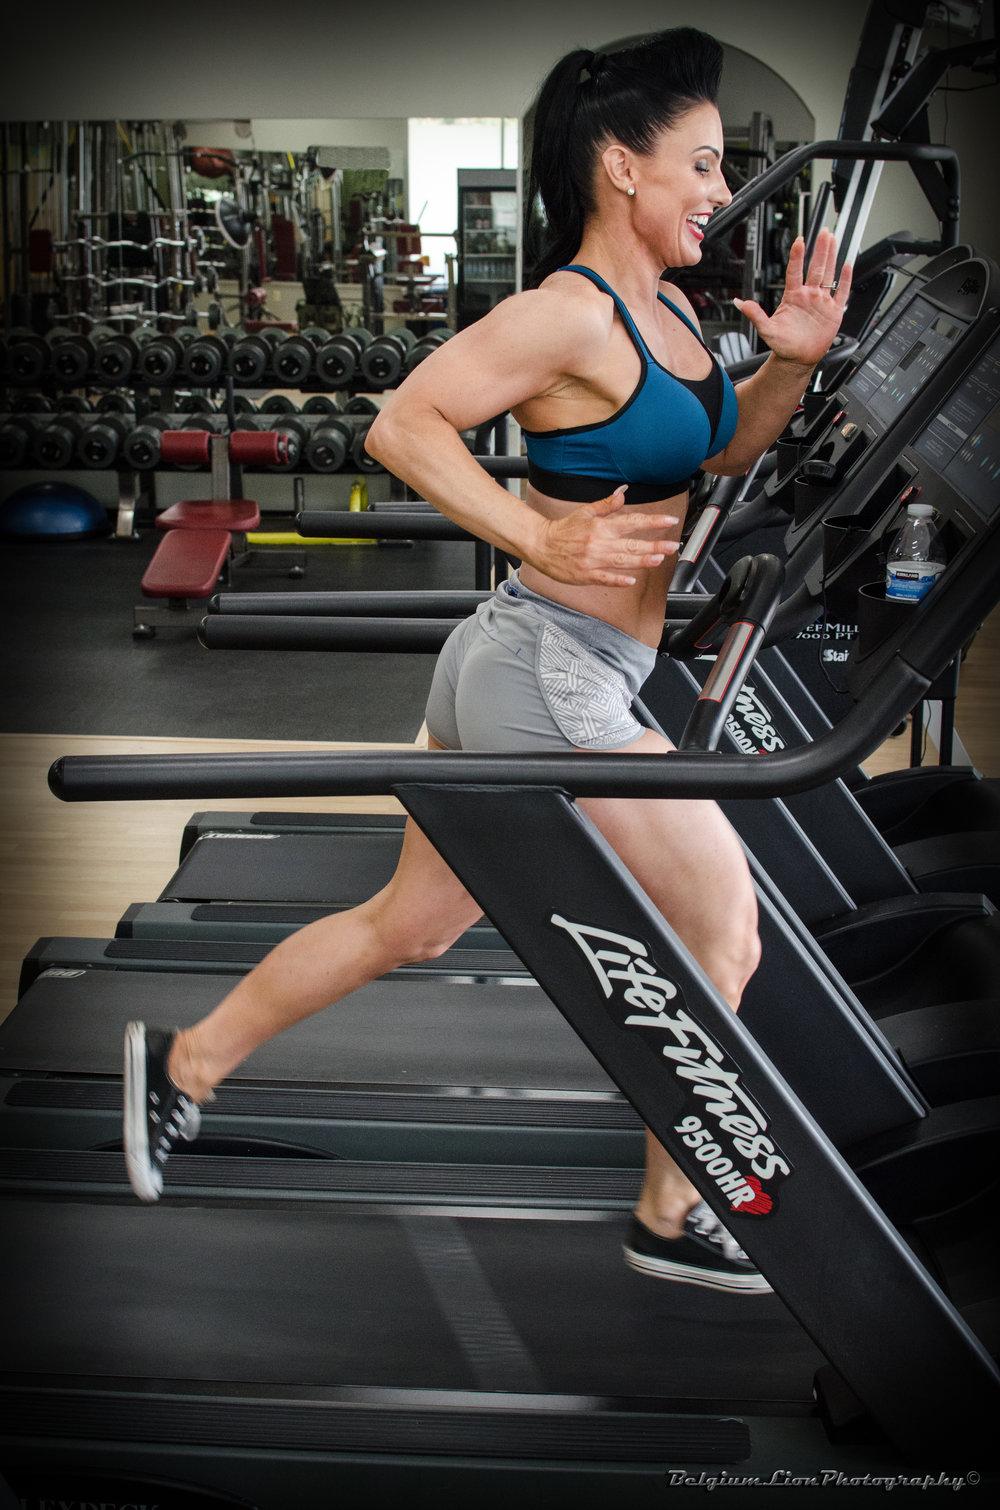 Burn that fat- Step it up cardio program